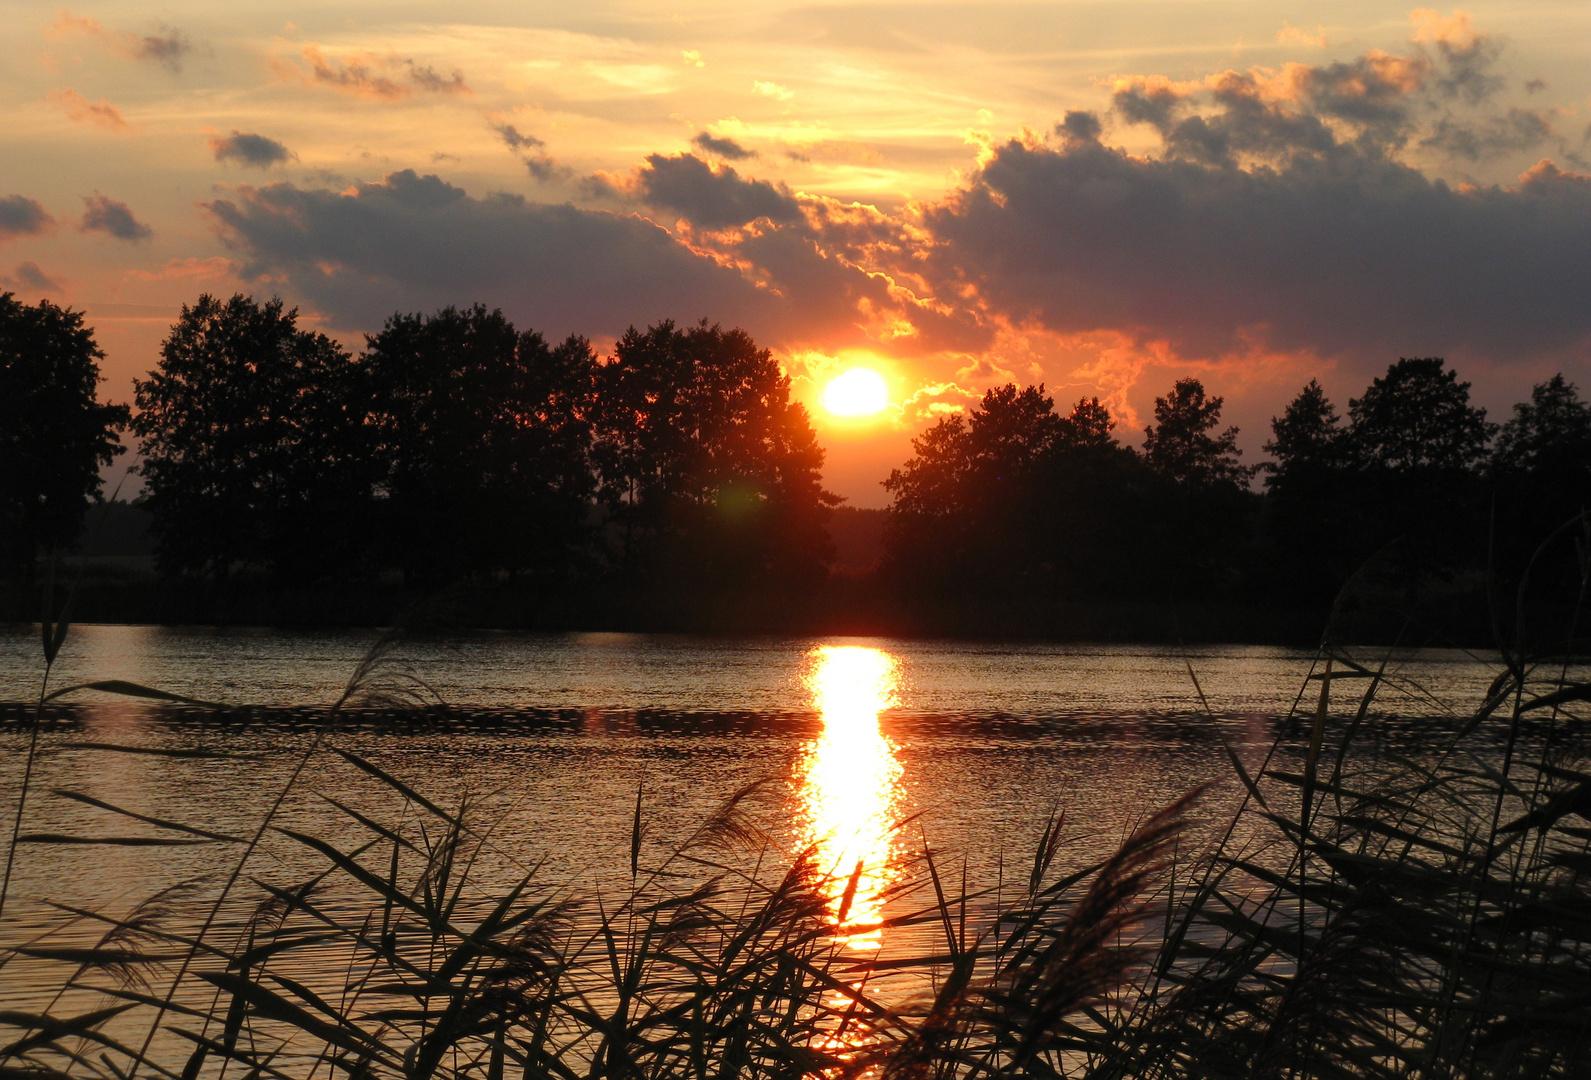 Sonnenuntergang 28.08.2012